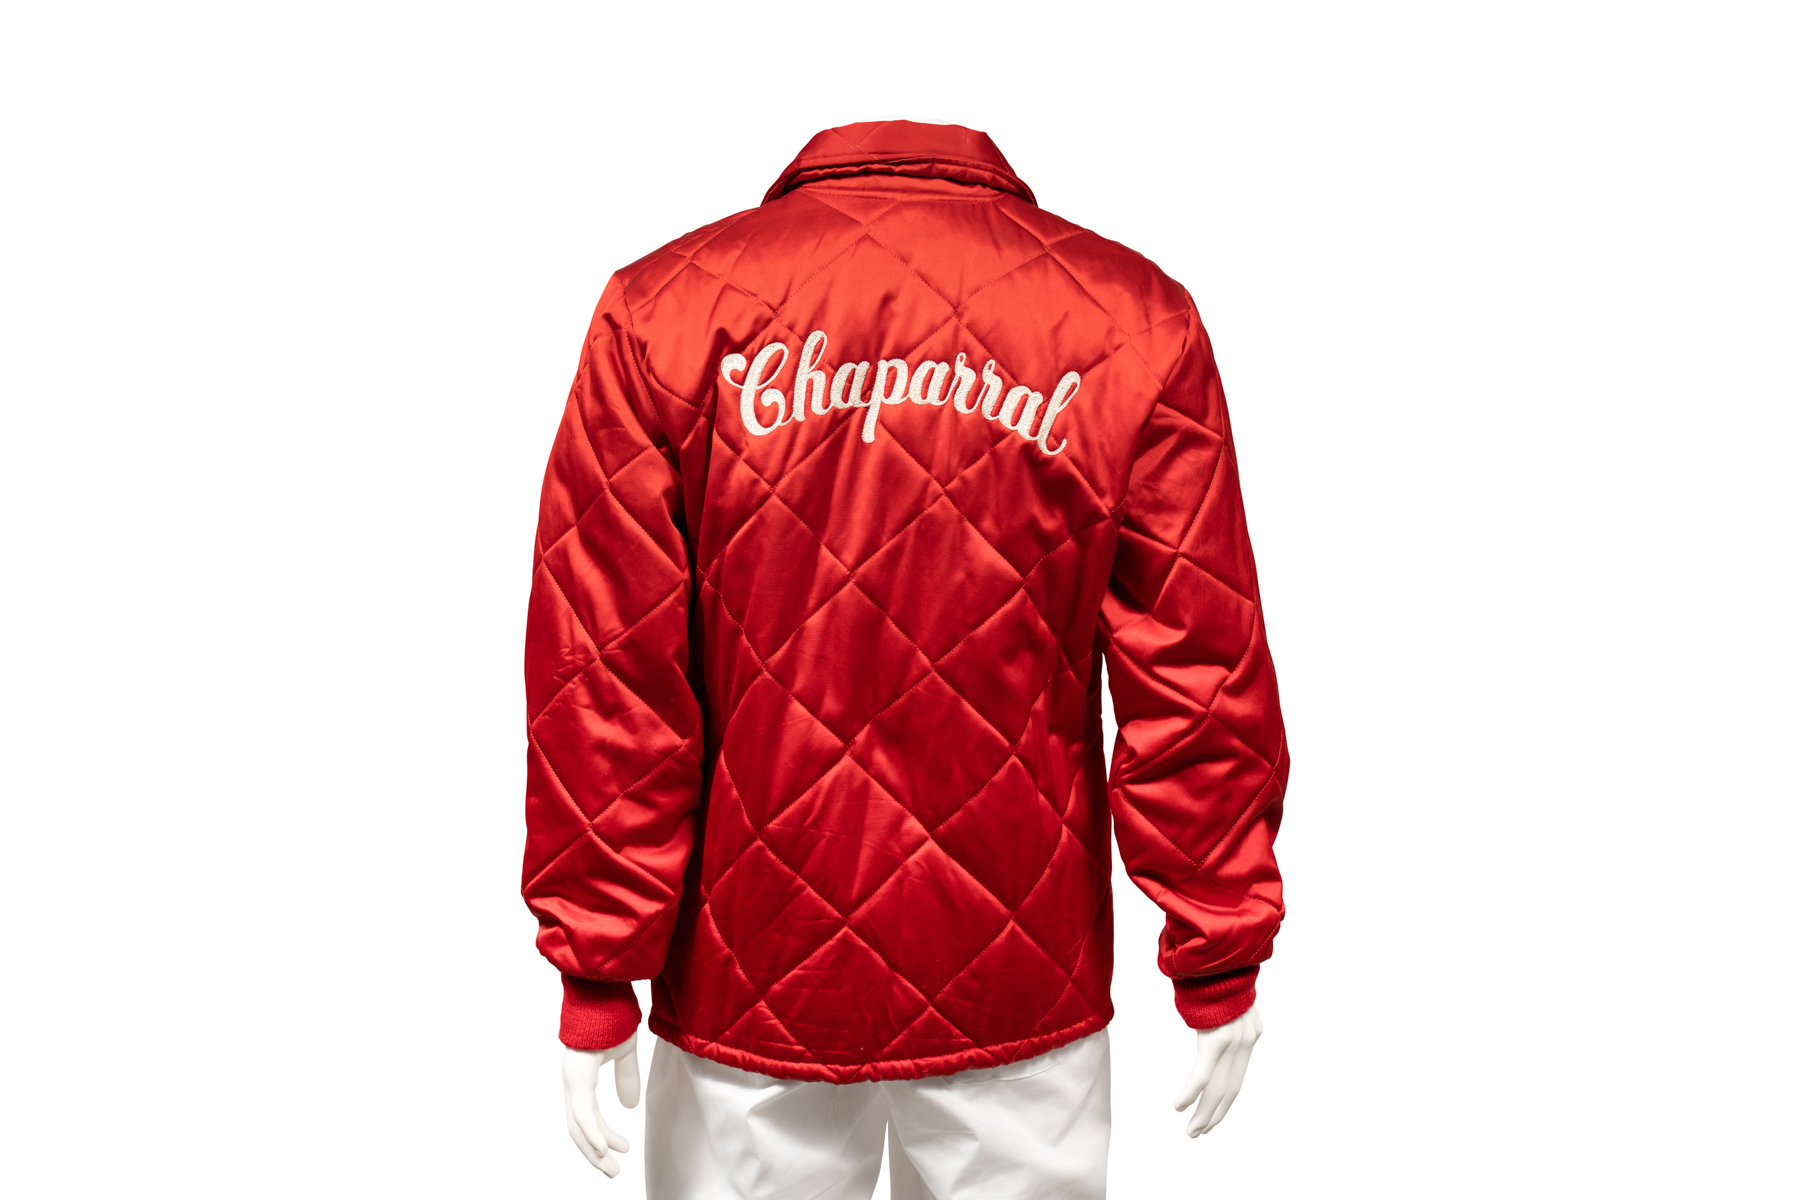 phil hill chaparral jacket back